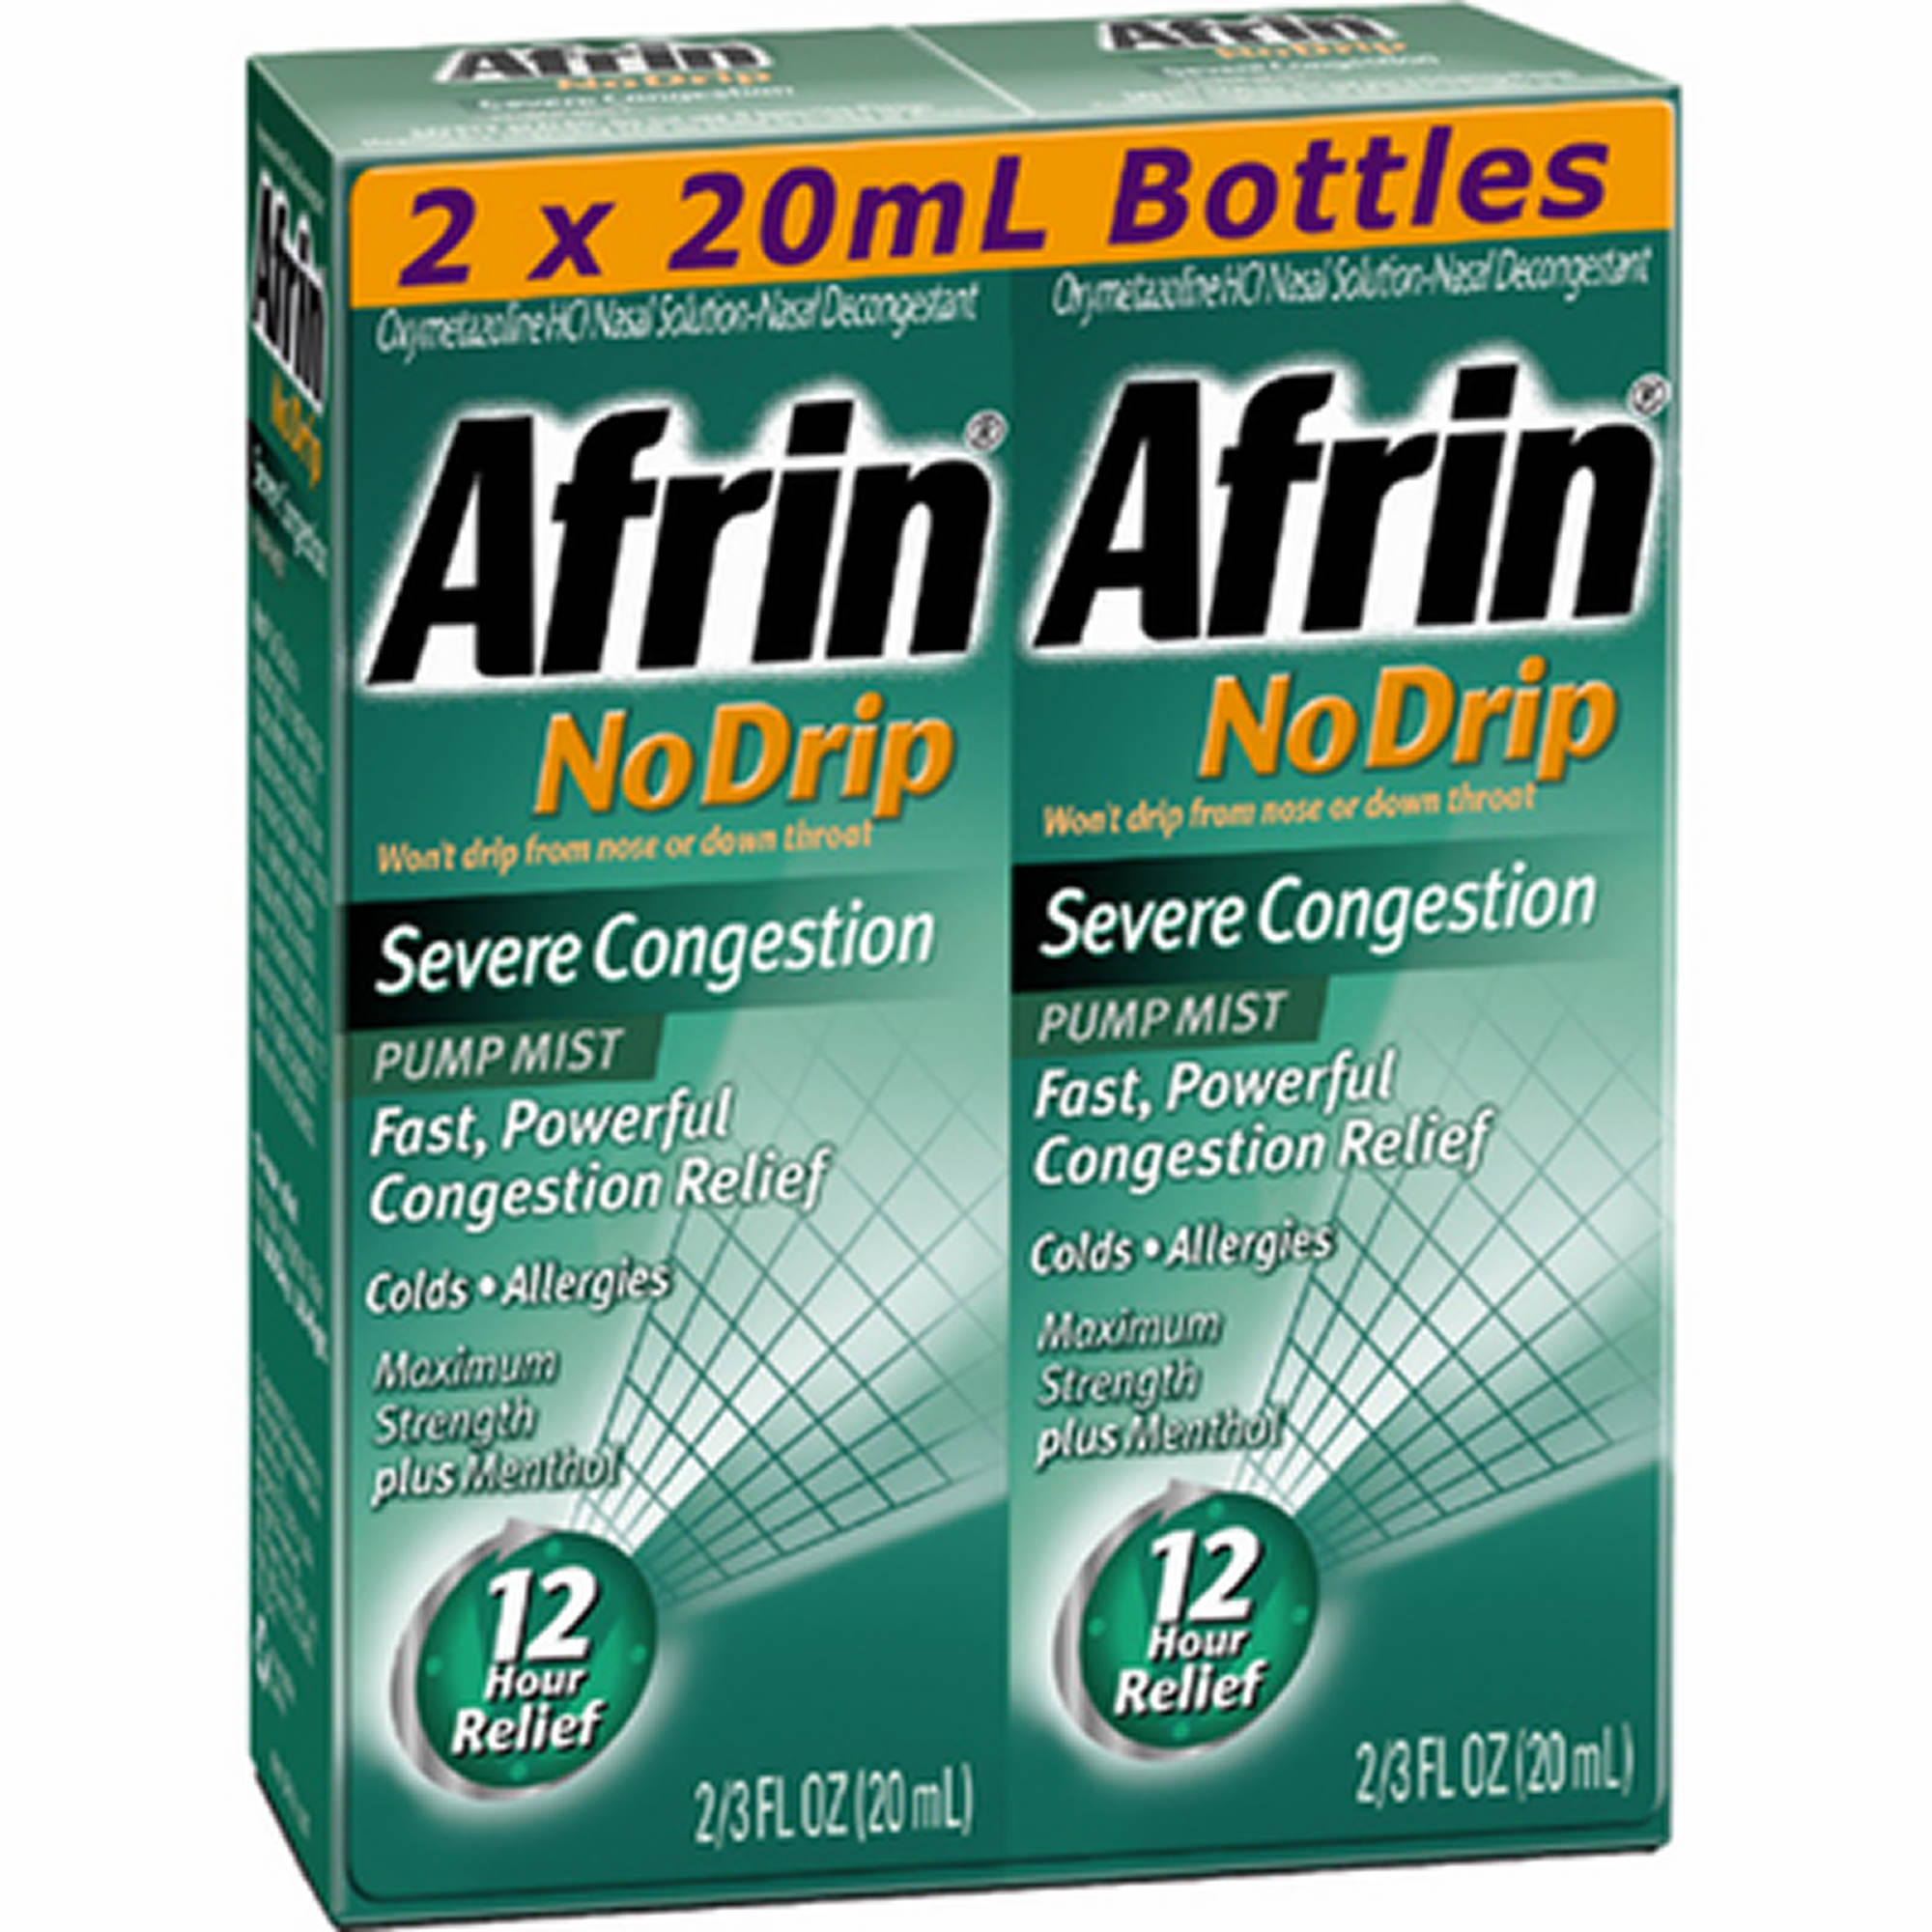 Afrin No Drip Severe Congestion Pump Mist, 2pk./3 fl. oz.